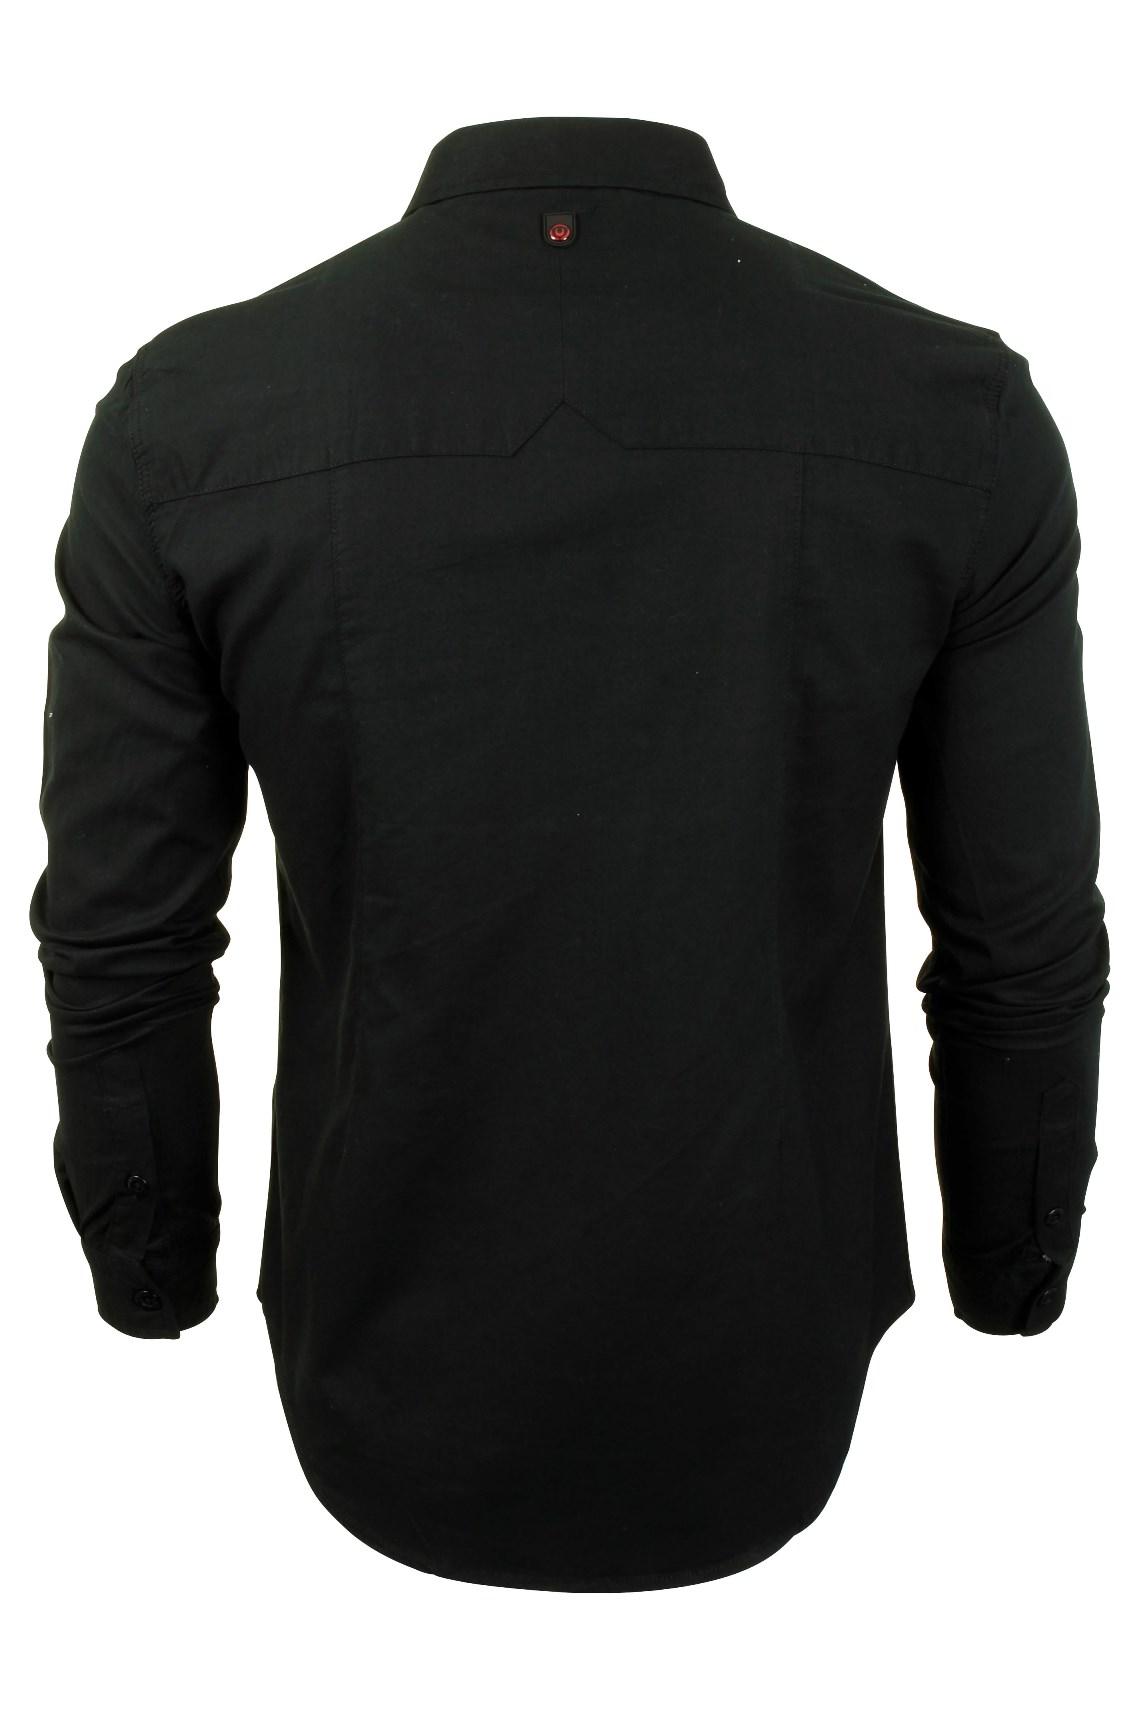 Para-Hombre-Franela-Camisa-por-Pato-Y-Cubierta-039-Katlego-039-Manga-Larga miniatura 5